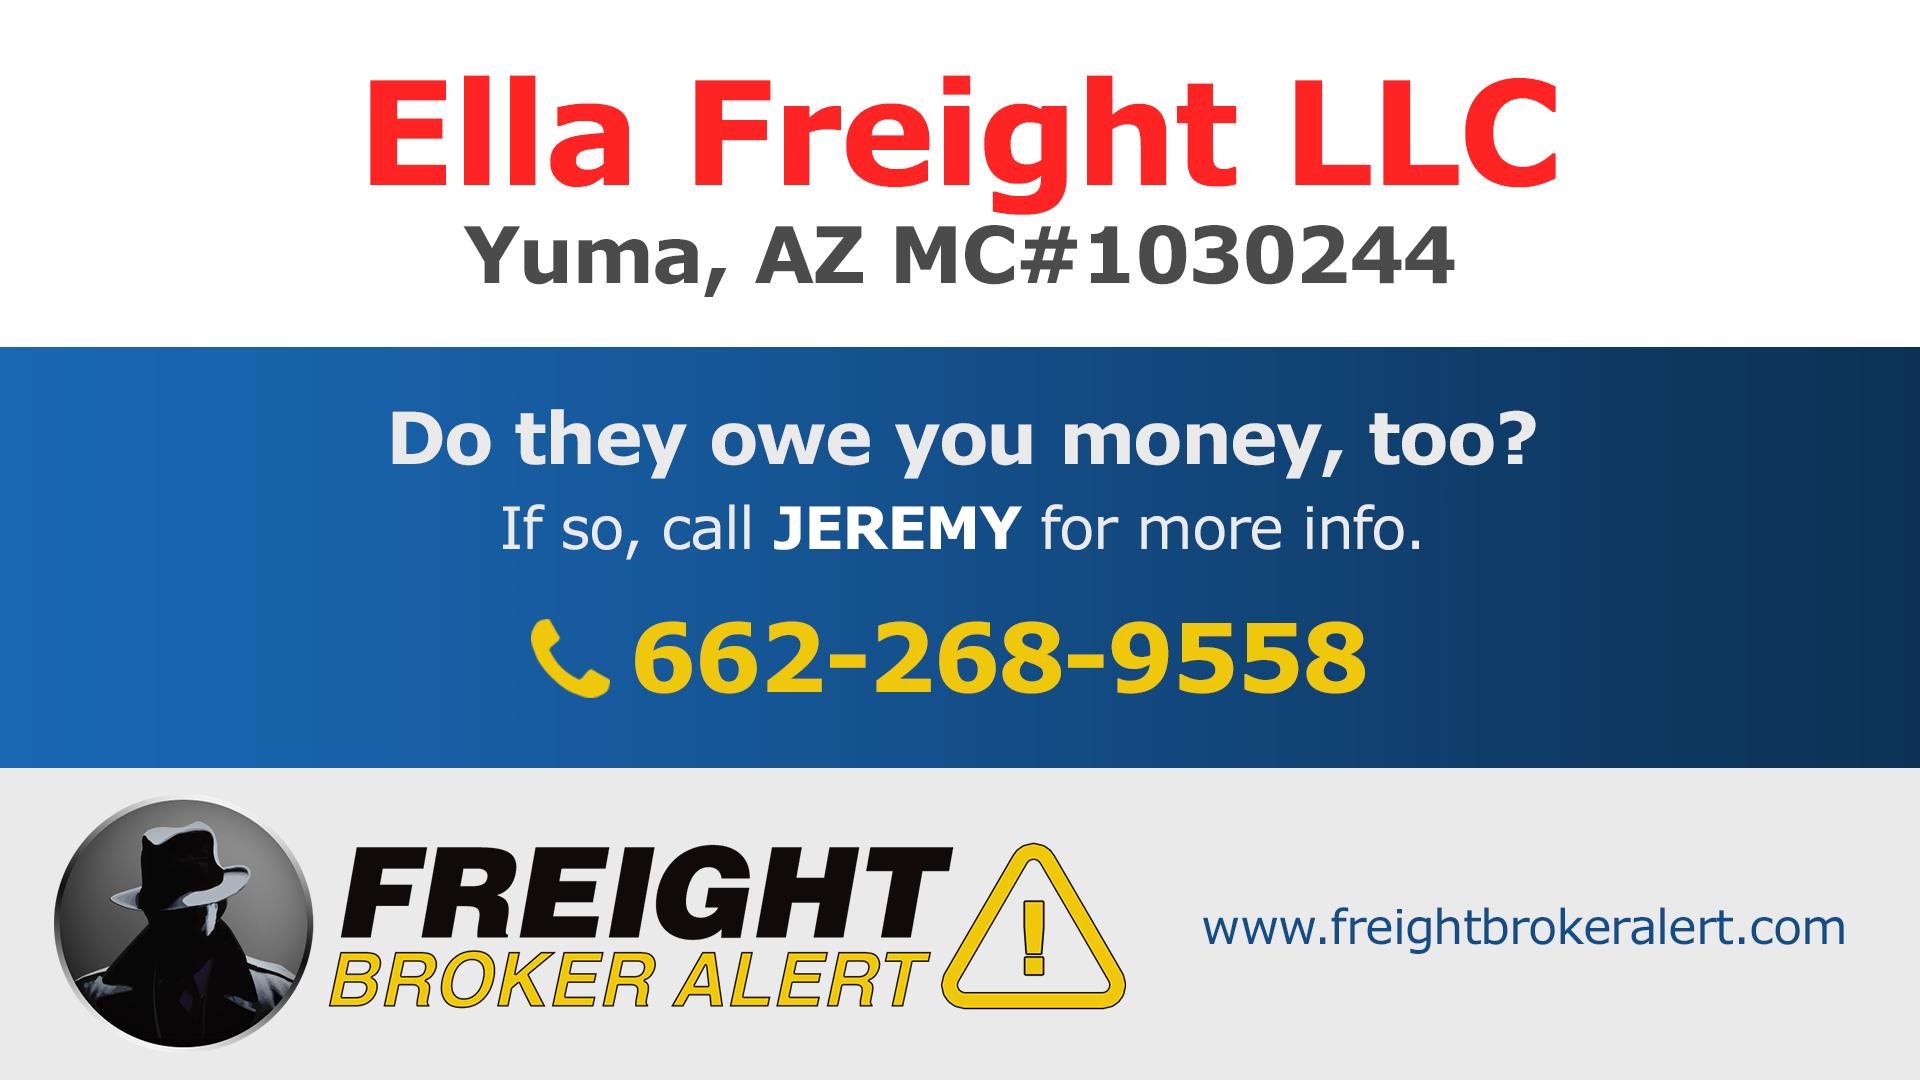 Ella Freight LLC Arizona